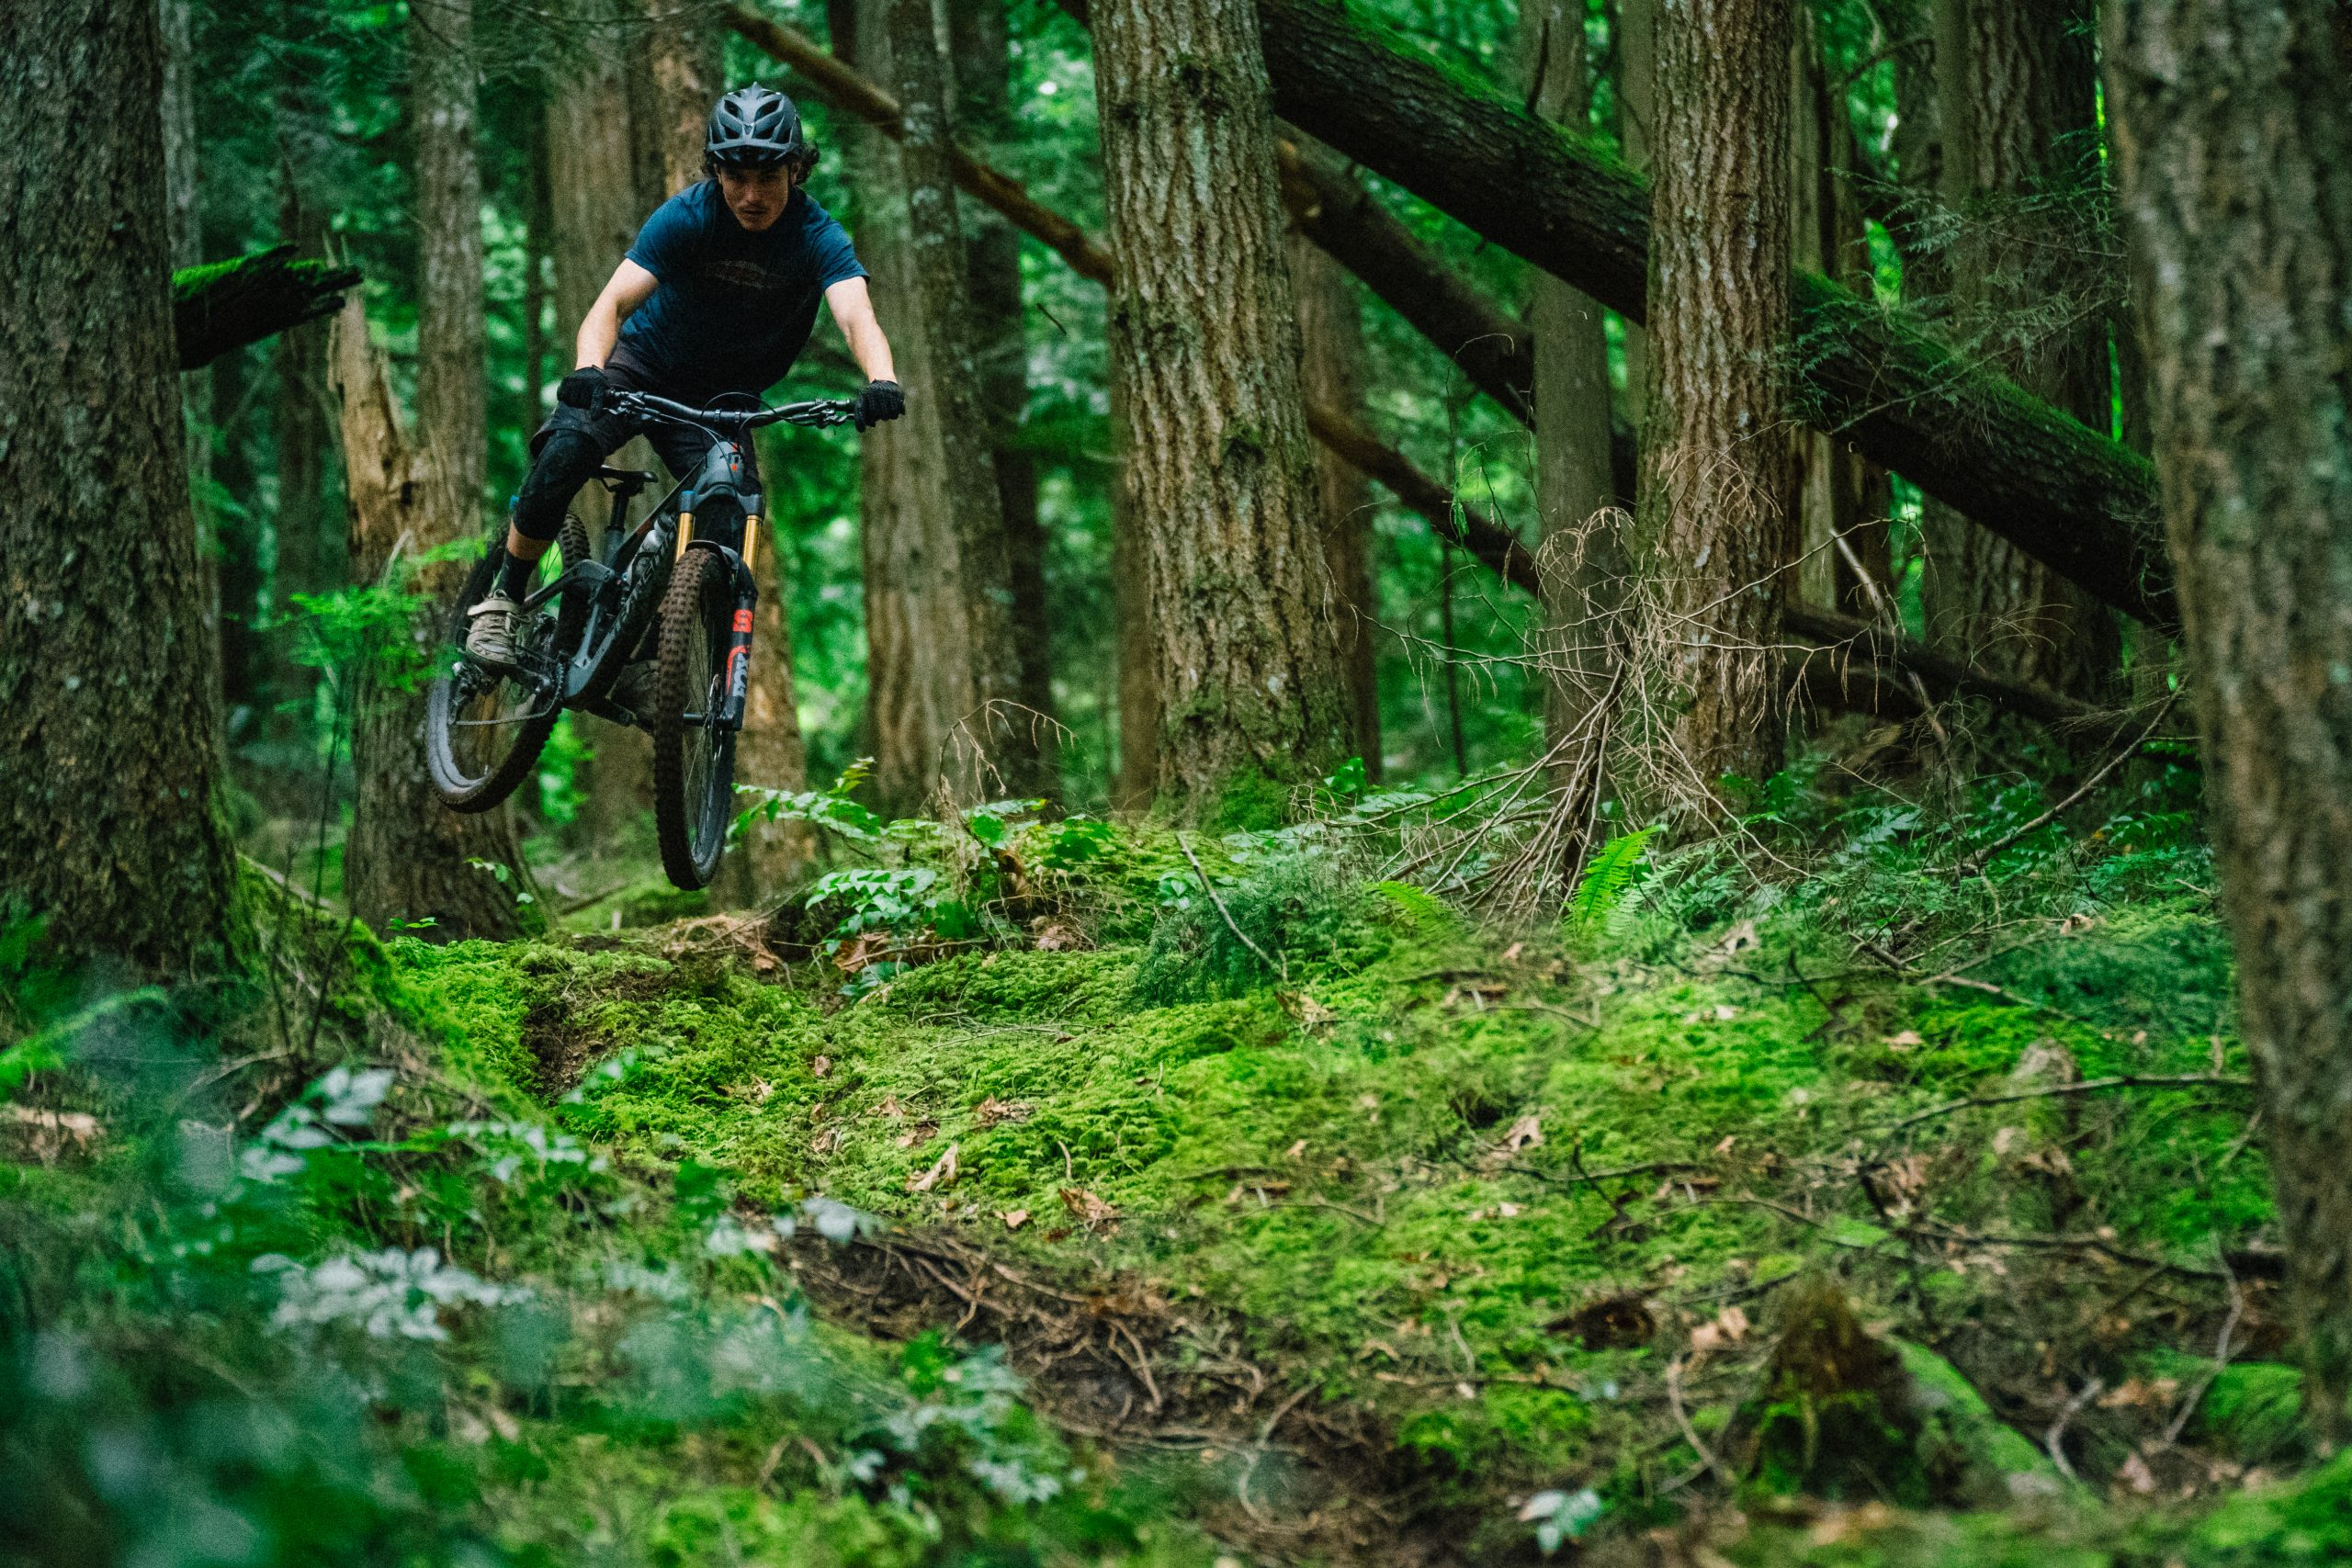 Transition Spire riding